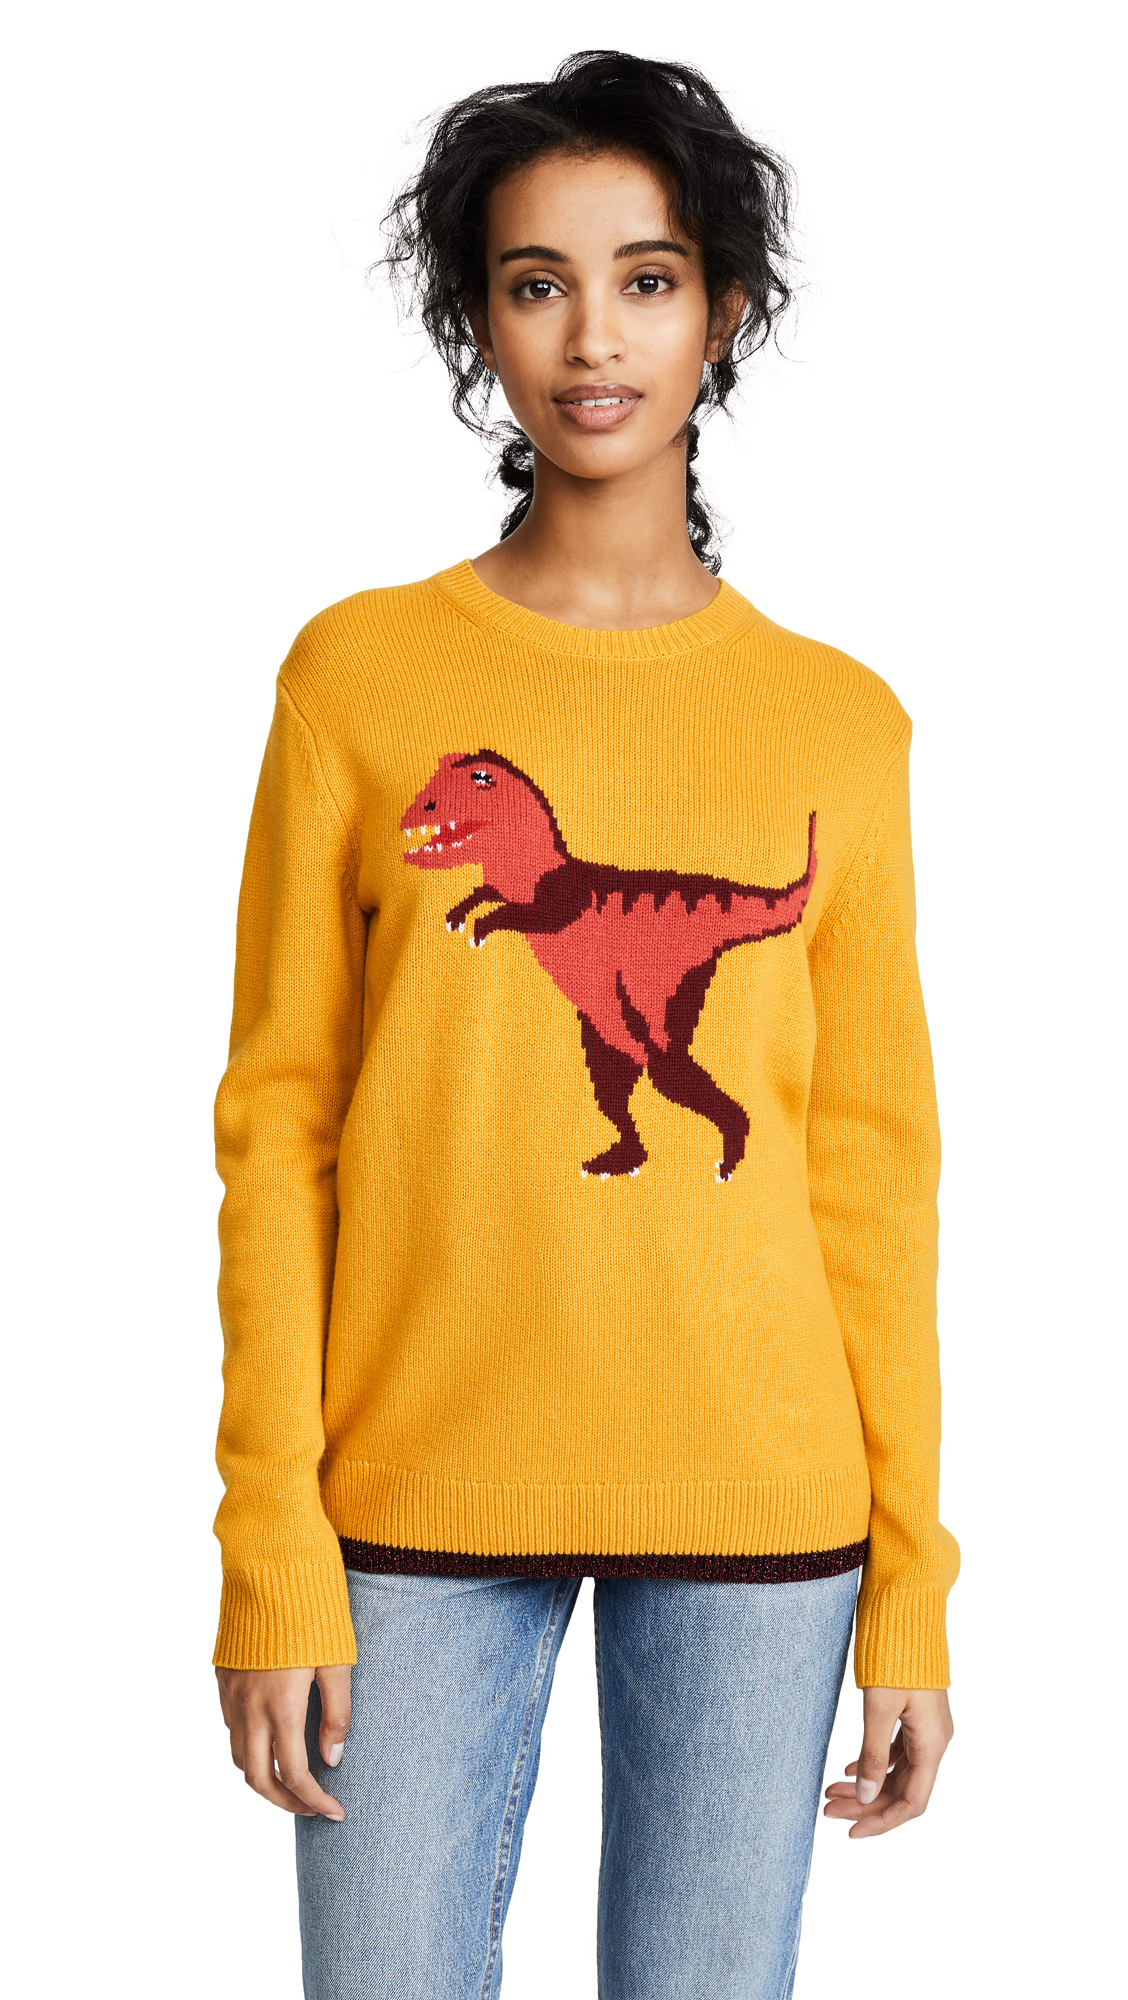 Coach 1941 Rexy Intarsia Sweater